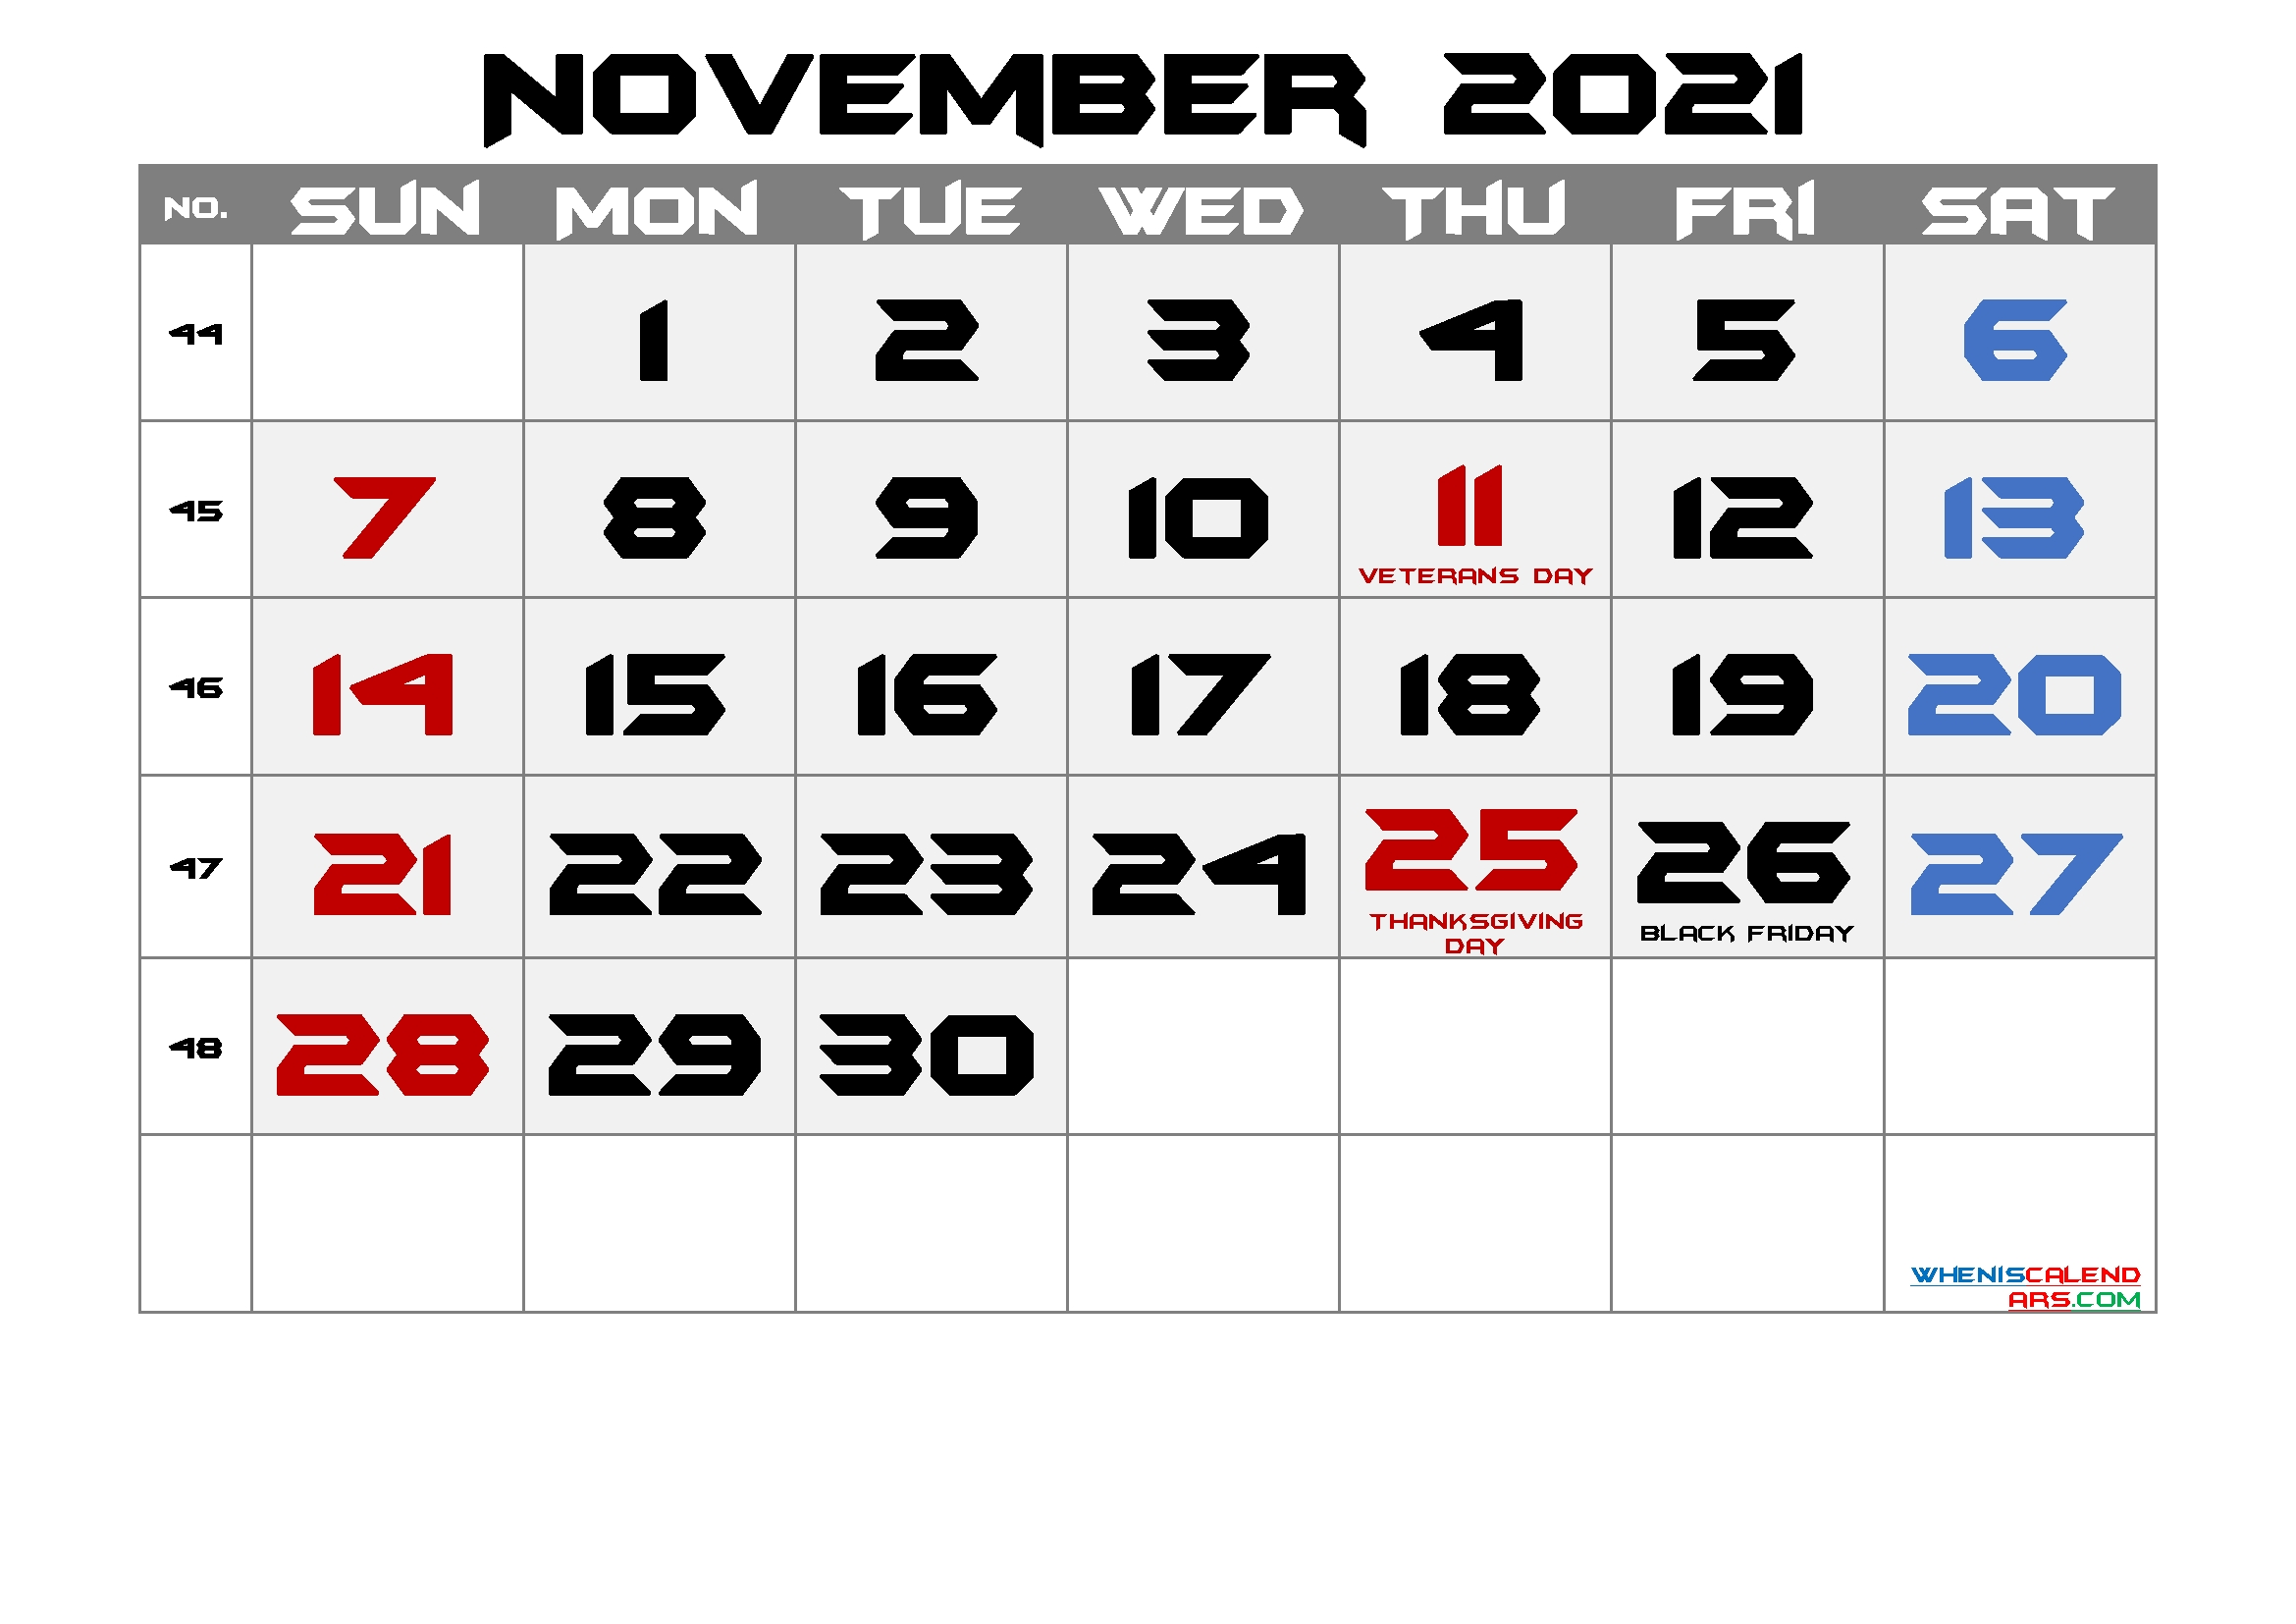 Printable November 2021 Calendar With Holidays | Free Printable 2020 Calendar With Holidays November December 2020 January 2021 Calendar